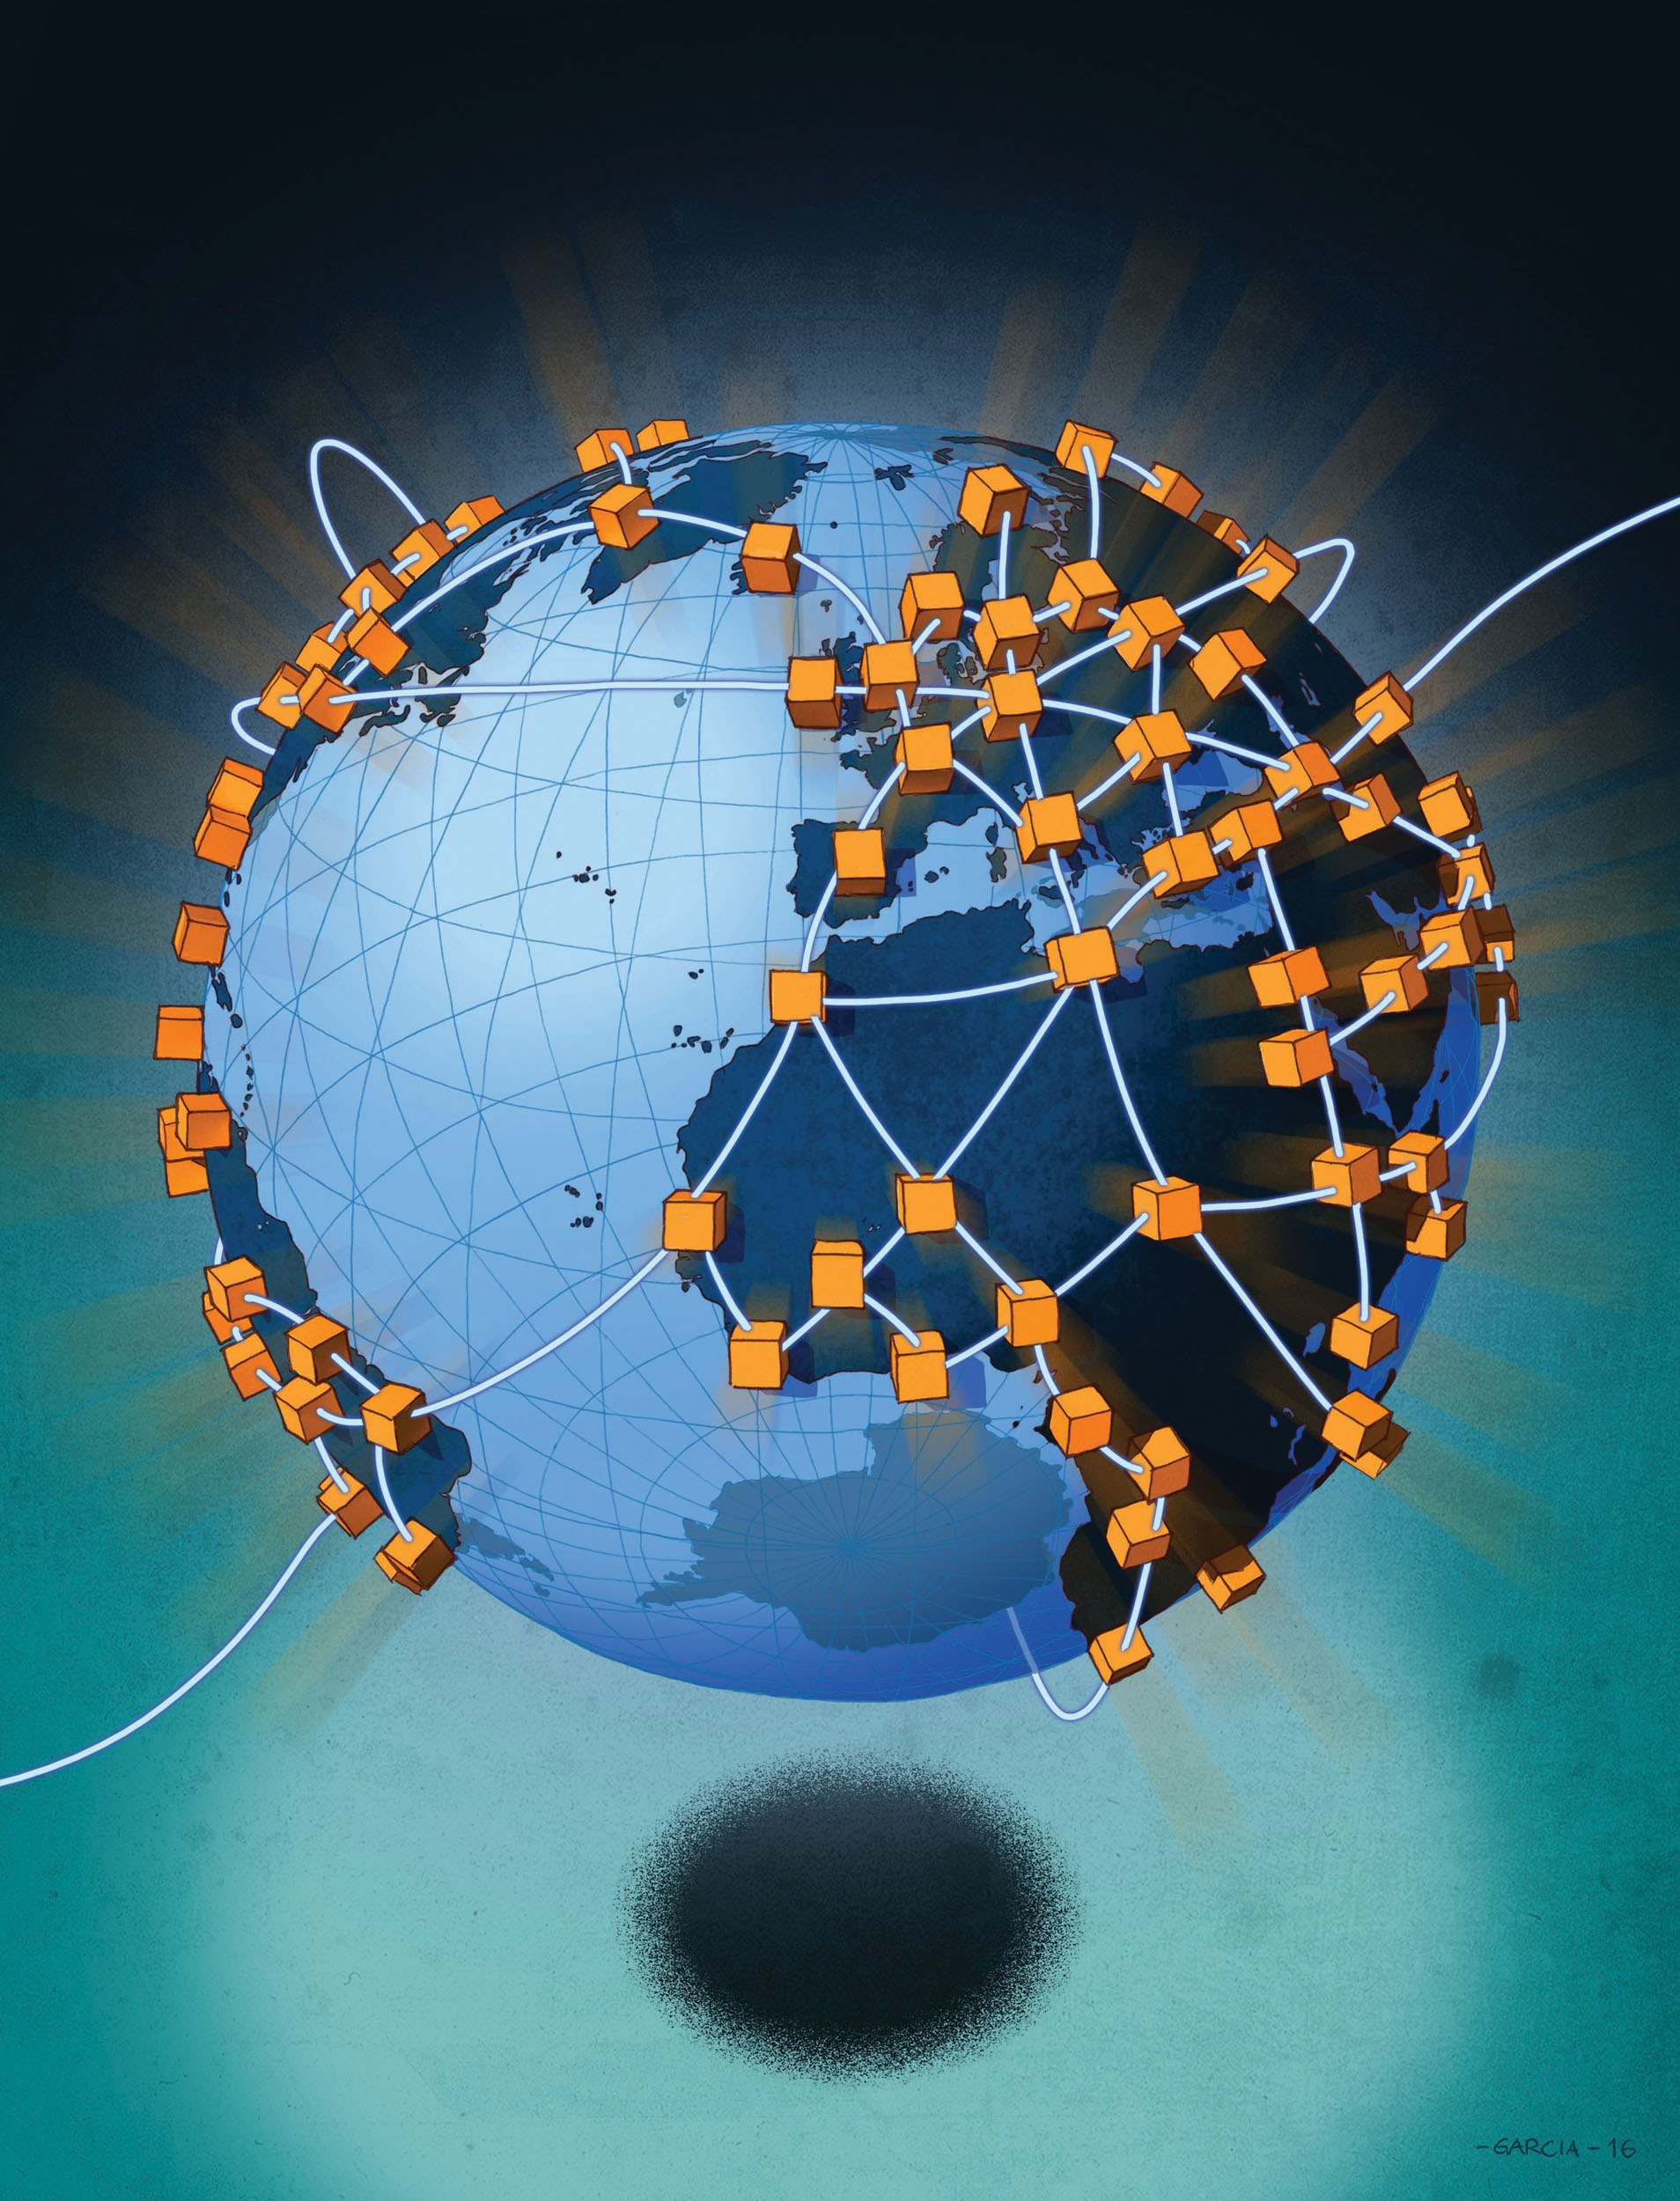 Daniel Garcia Art Illustration Blockchain Internet Technology World